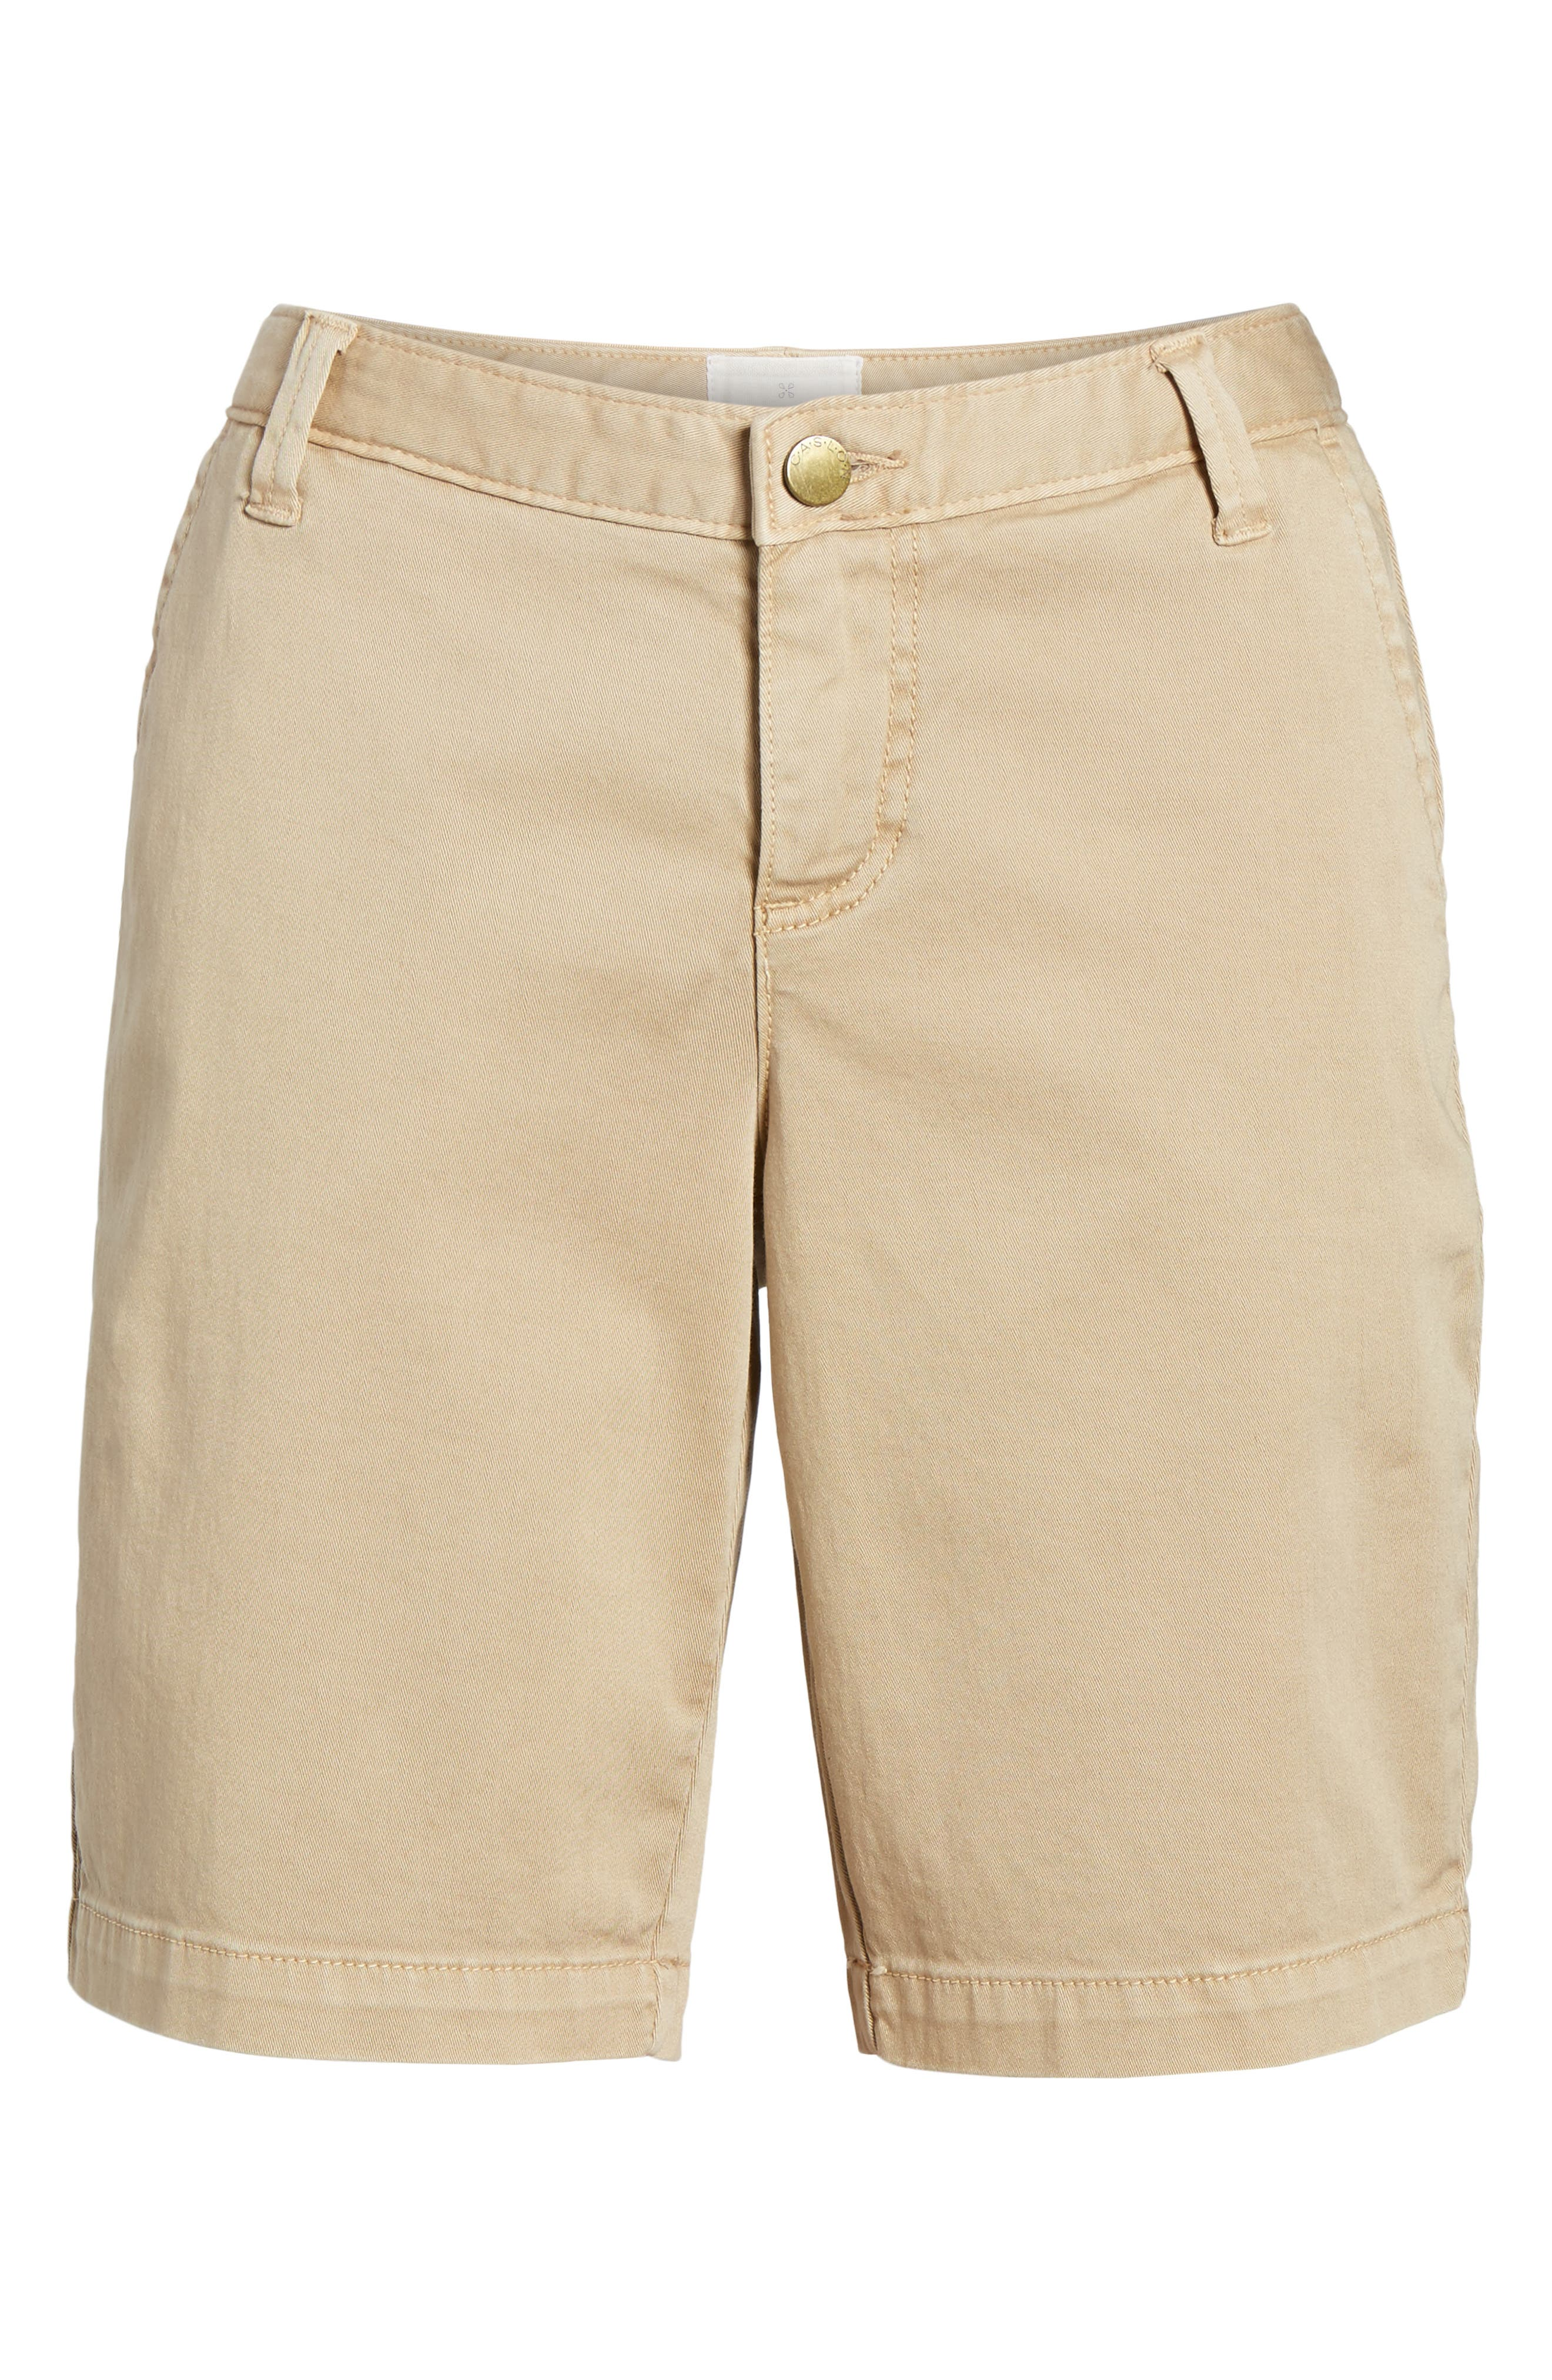 Twill Shorts,                             Alternate thumbnail 53, color,